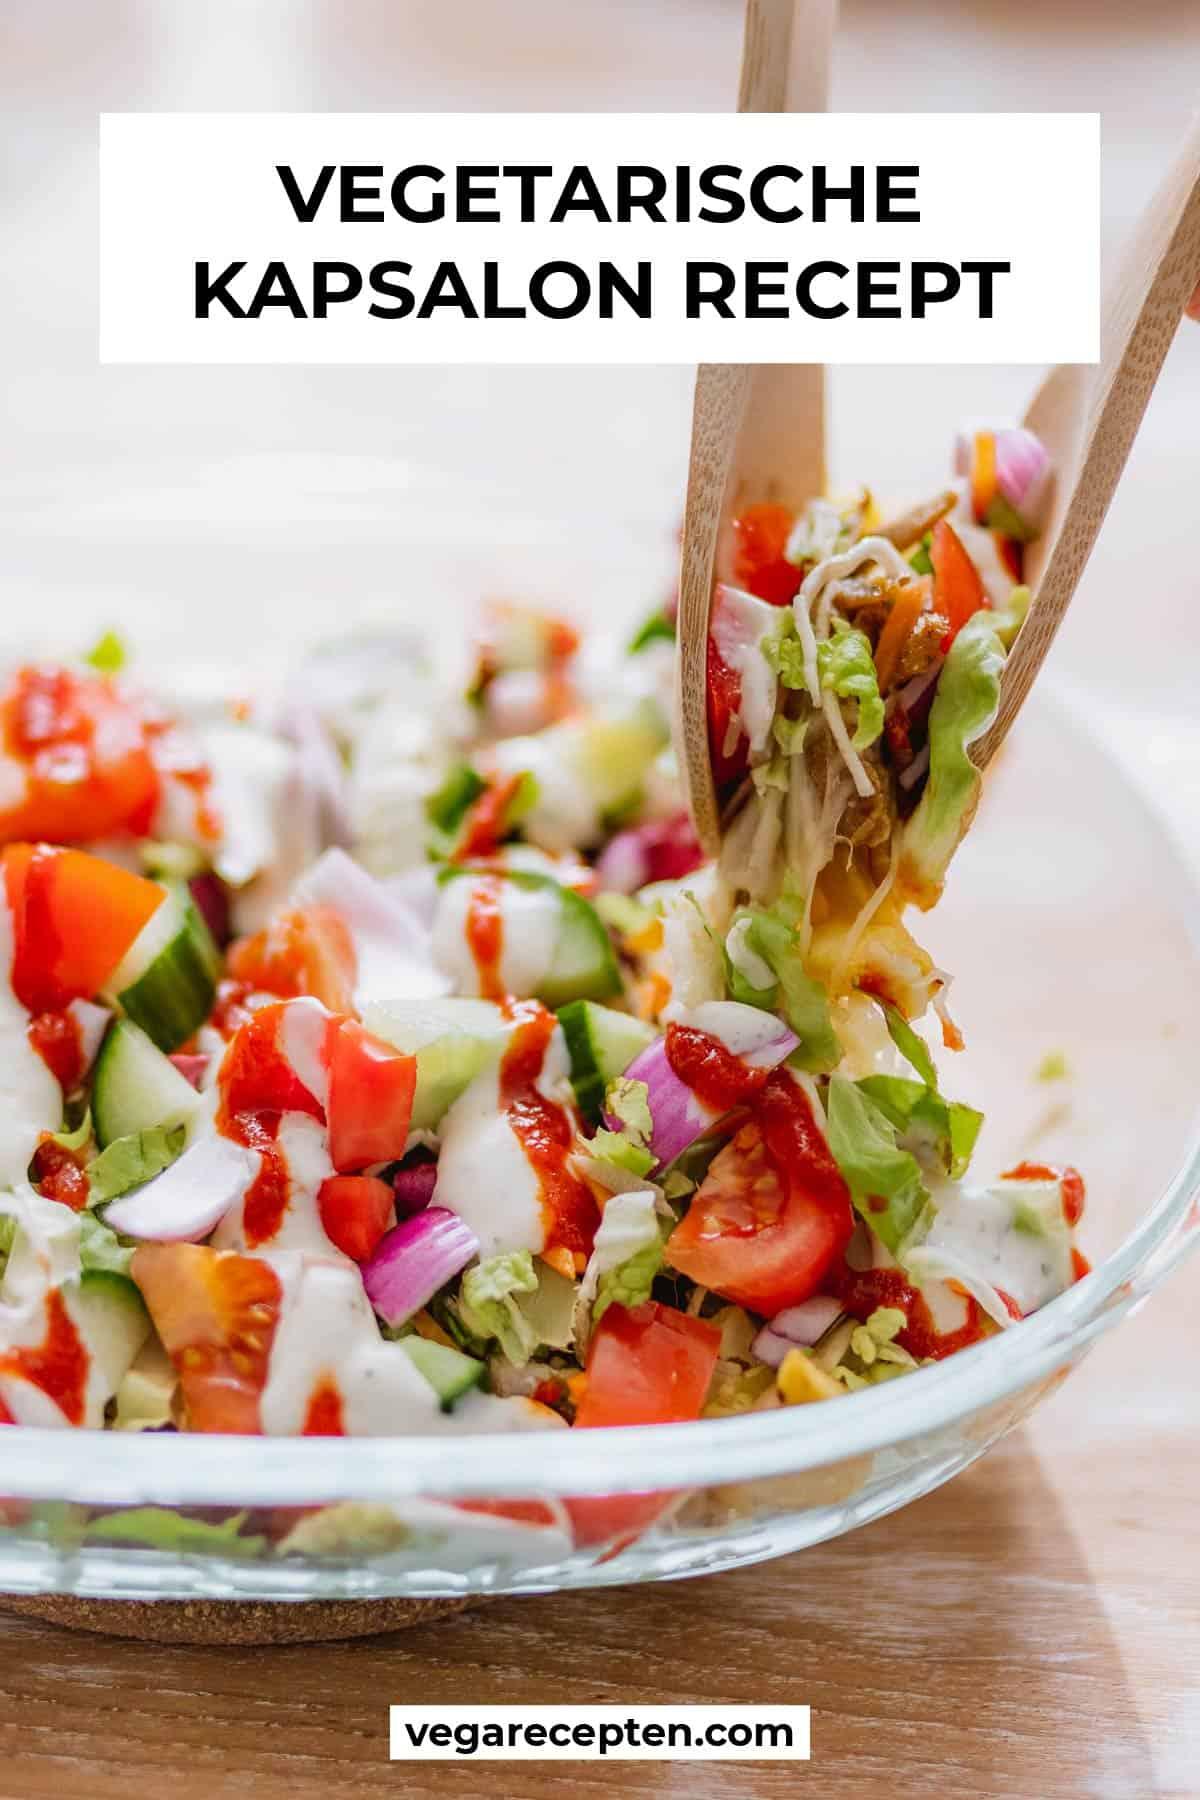 Vegetarische kapsalon recept